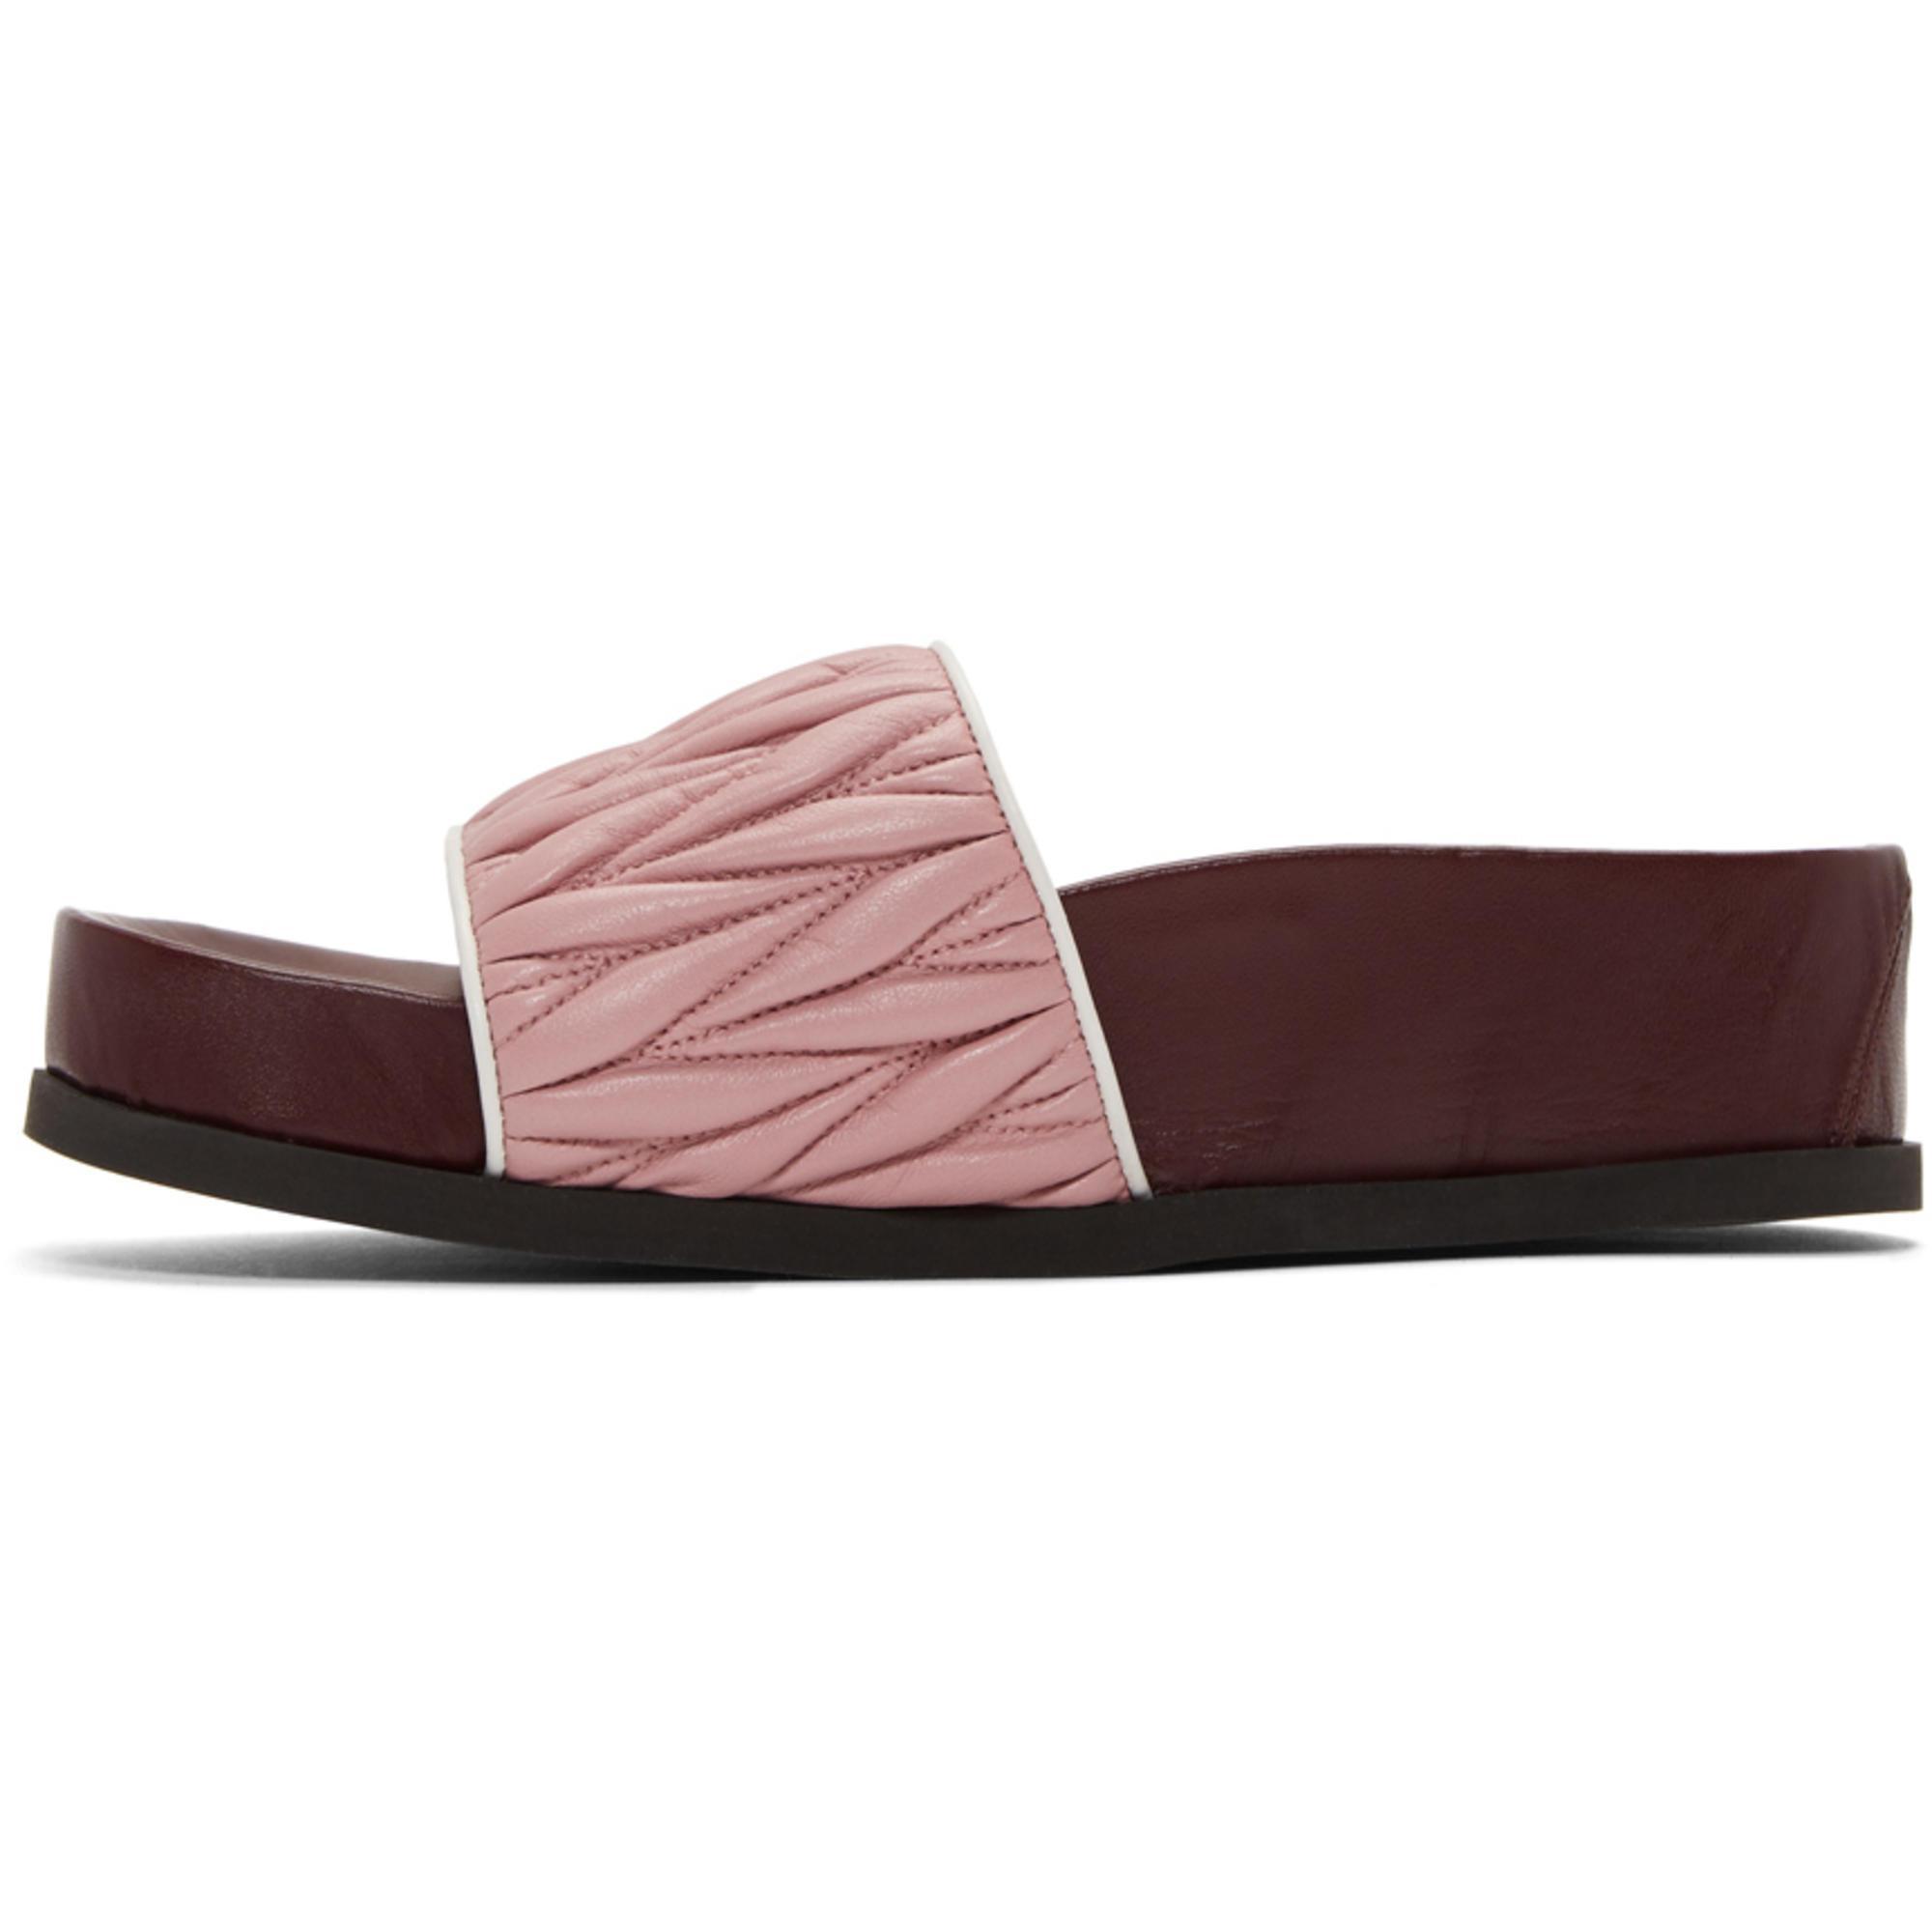 Miu Miu & Burbundy Quilted Platform Sandals ih7WtzEk